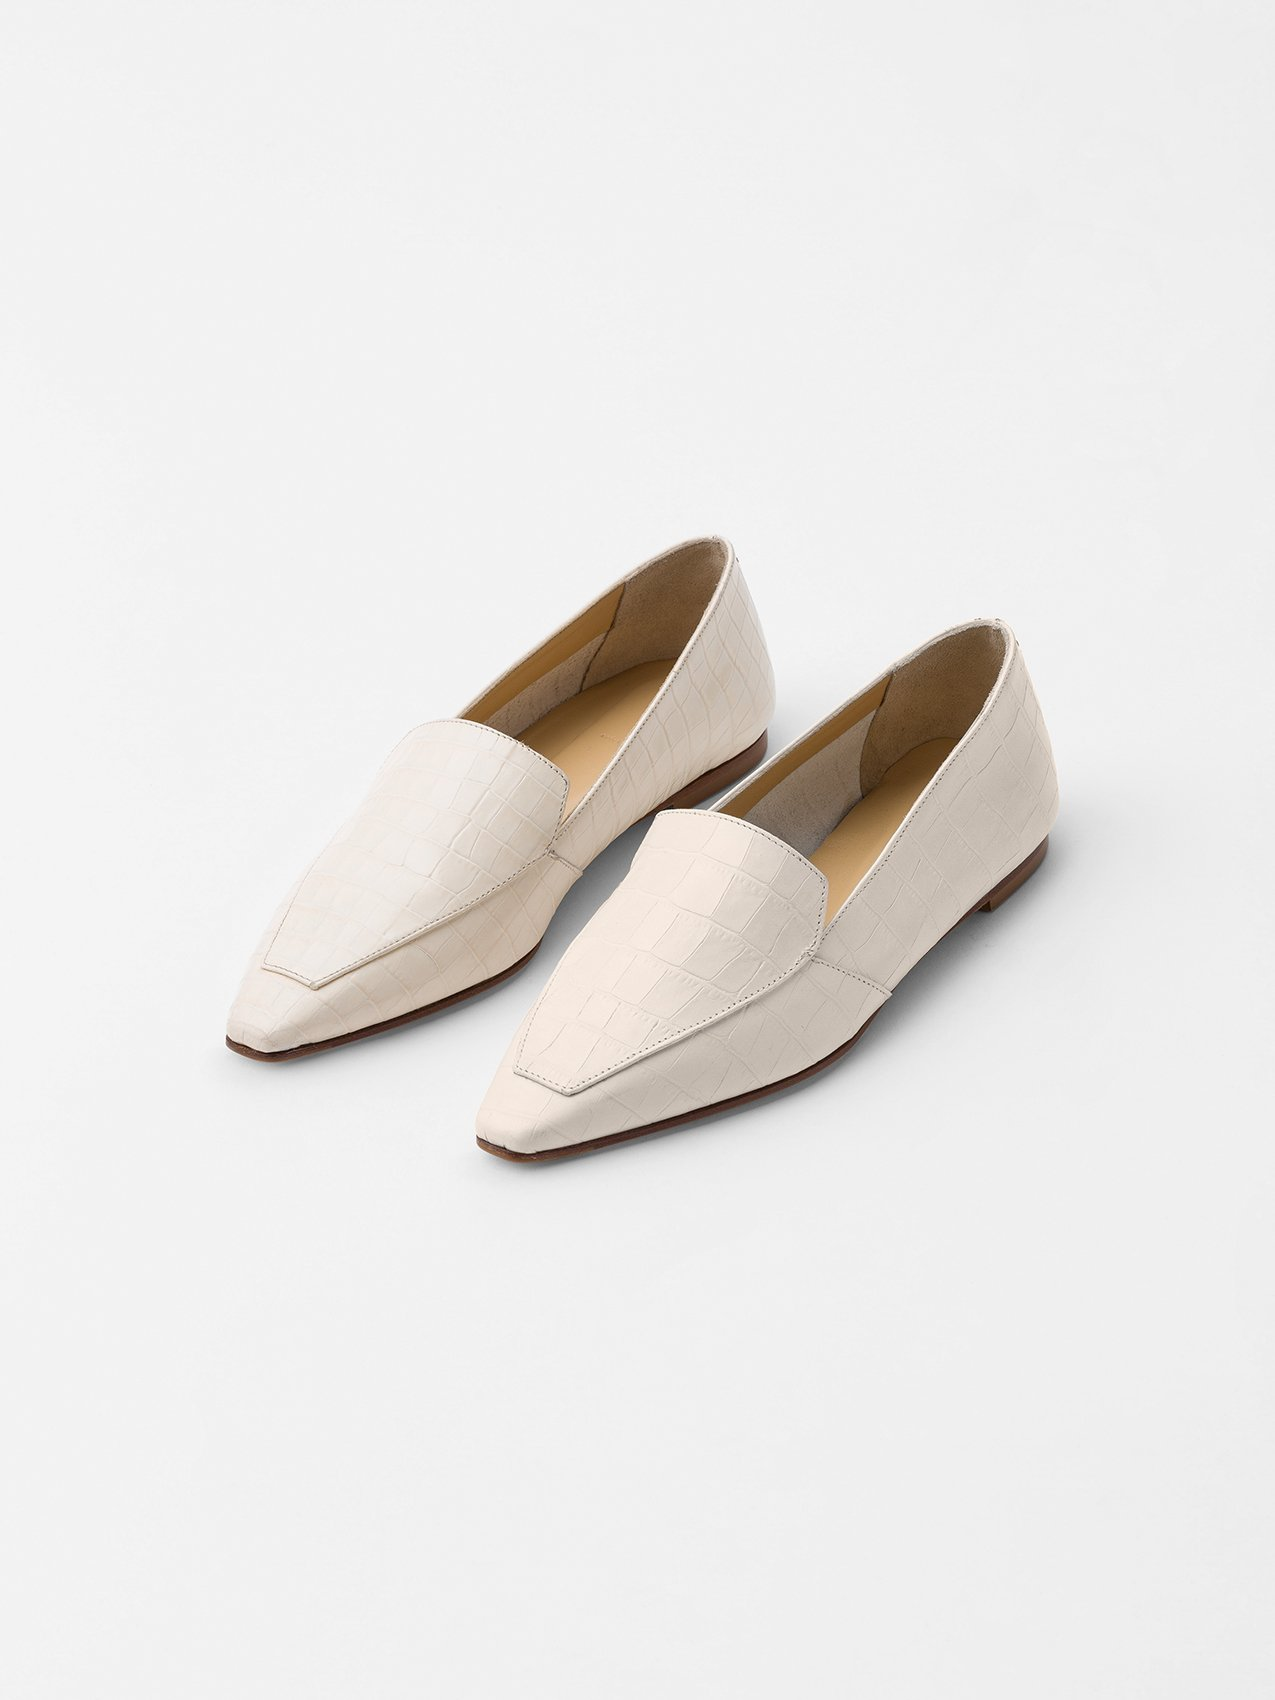 Tendenze-scarpe-primavera-estate-2020-Aeyde